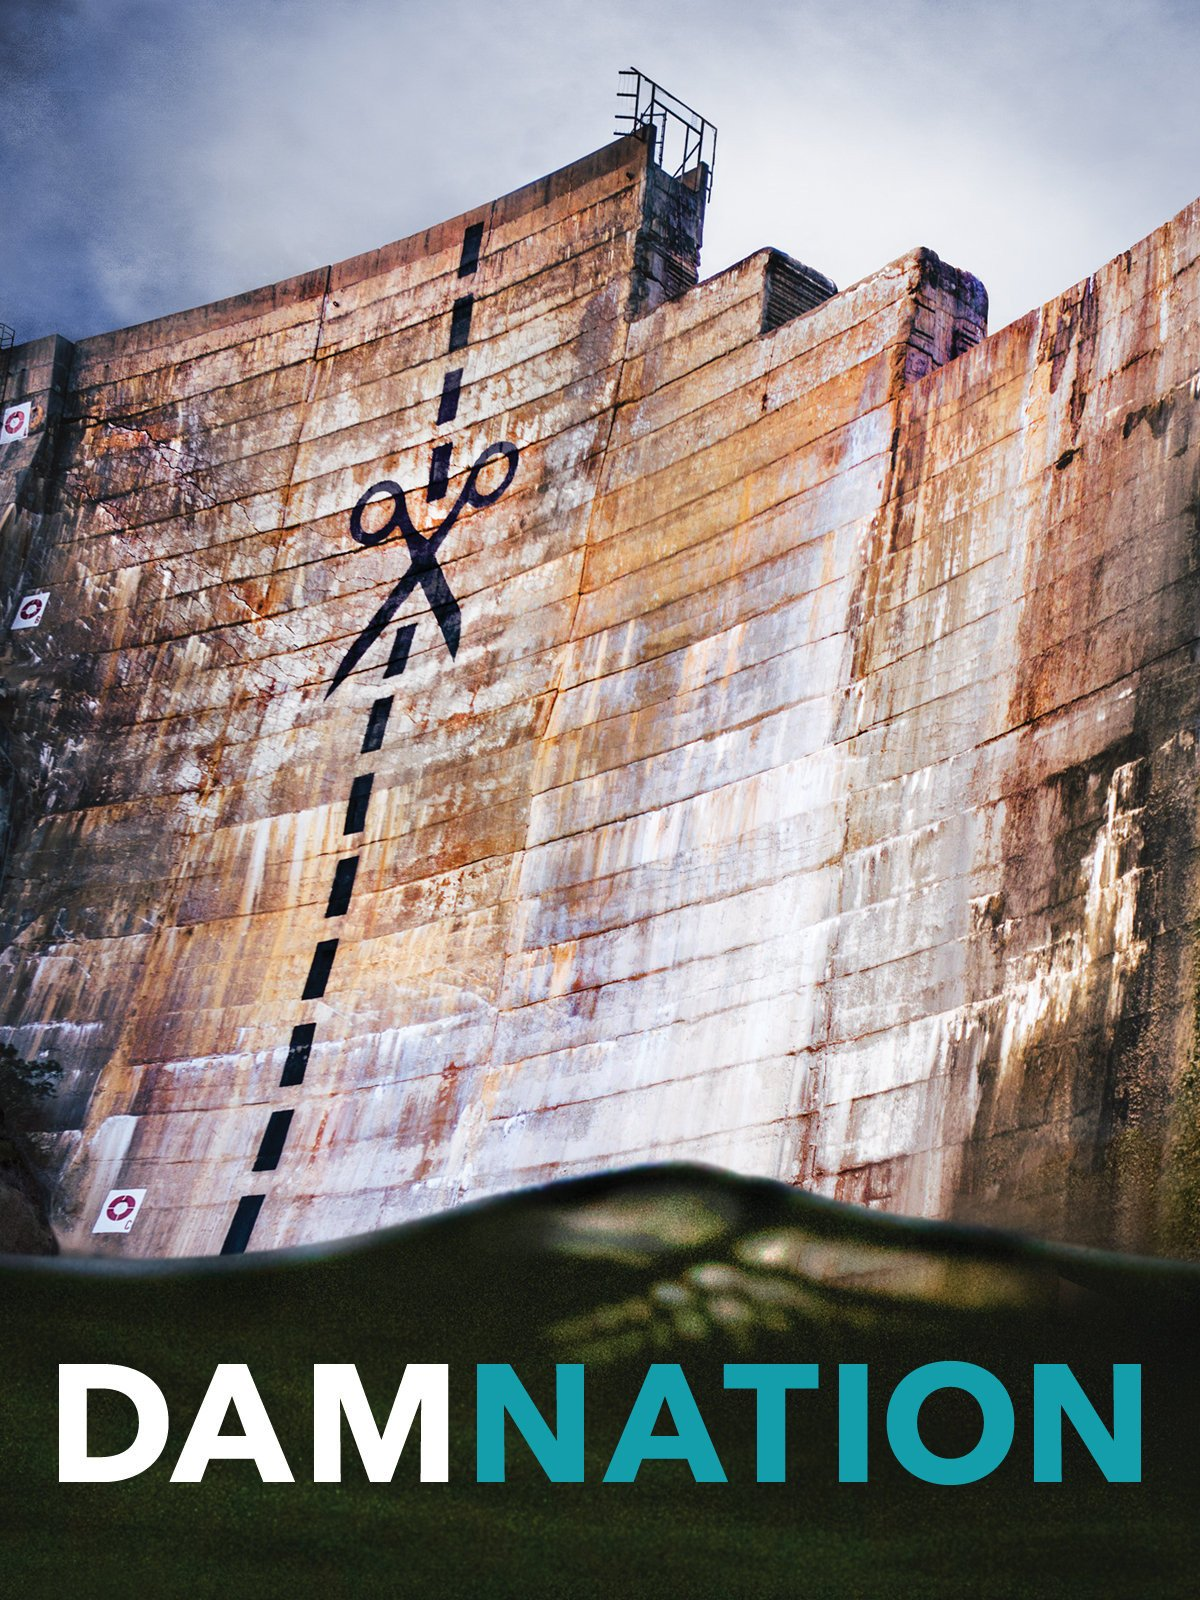 Amazon.com: DamNation (2014): Ben Knight, Ben Knight, Ben Knight ...